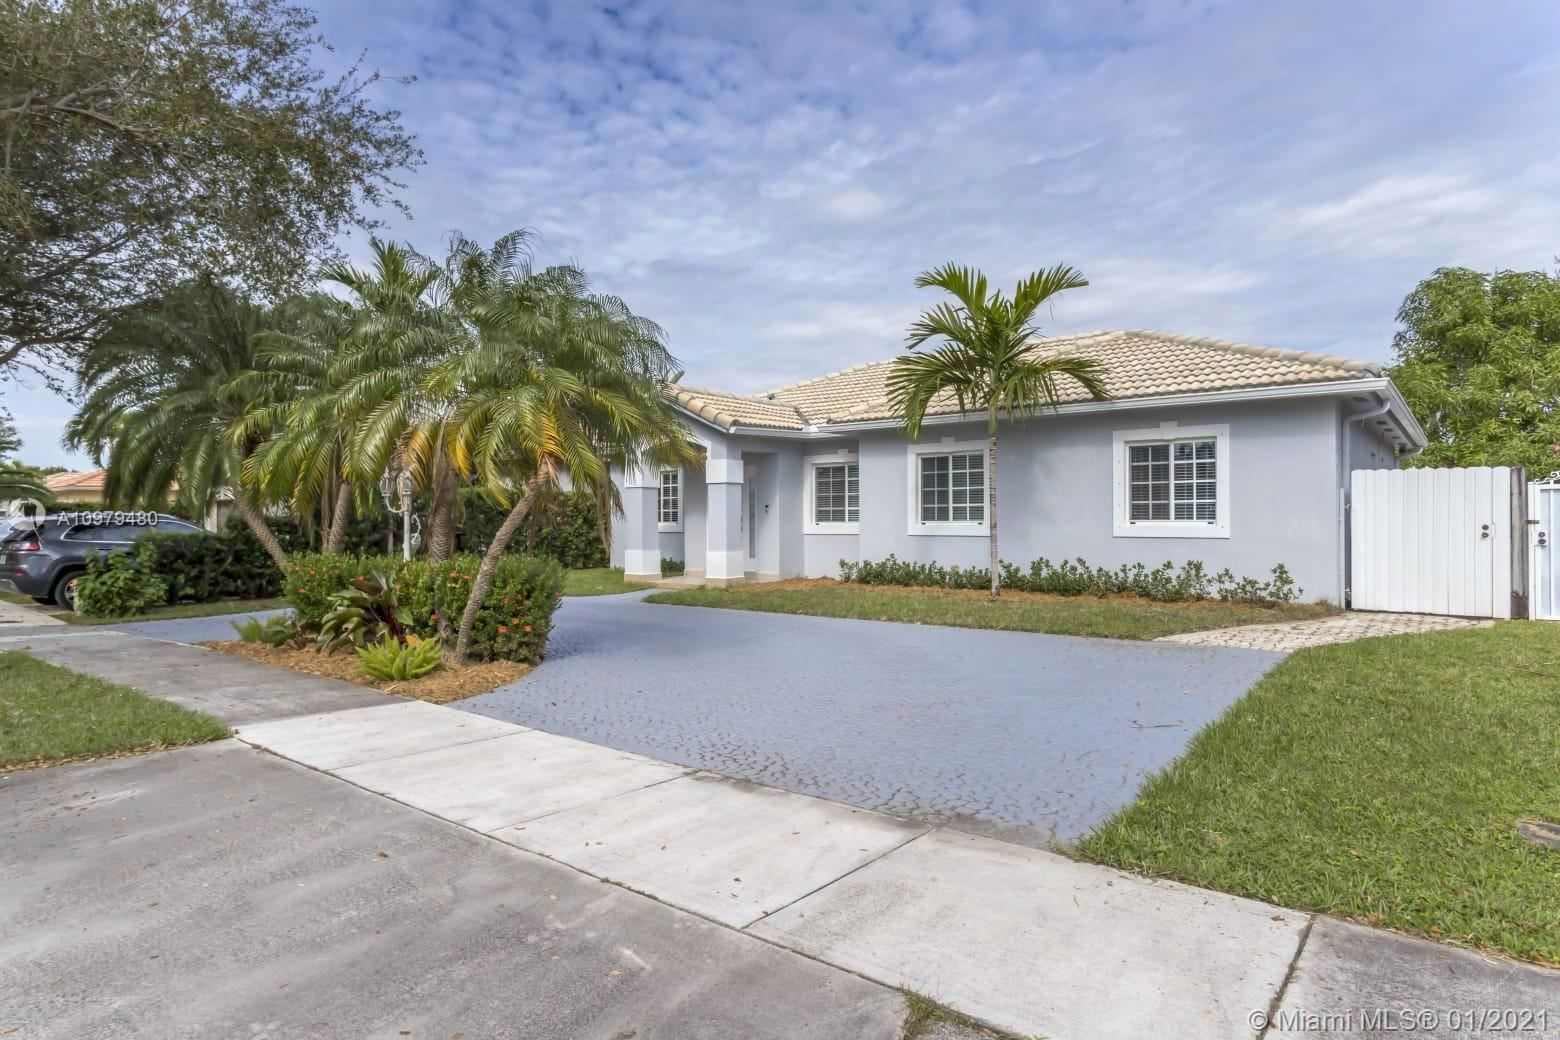 9025 NW 164th St, Miami Lakes, FL 33018 - #: A10979480